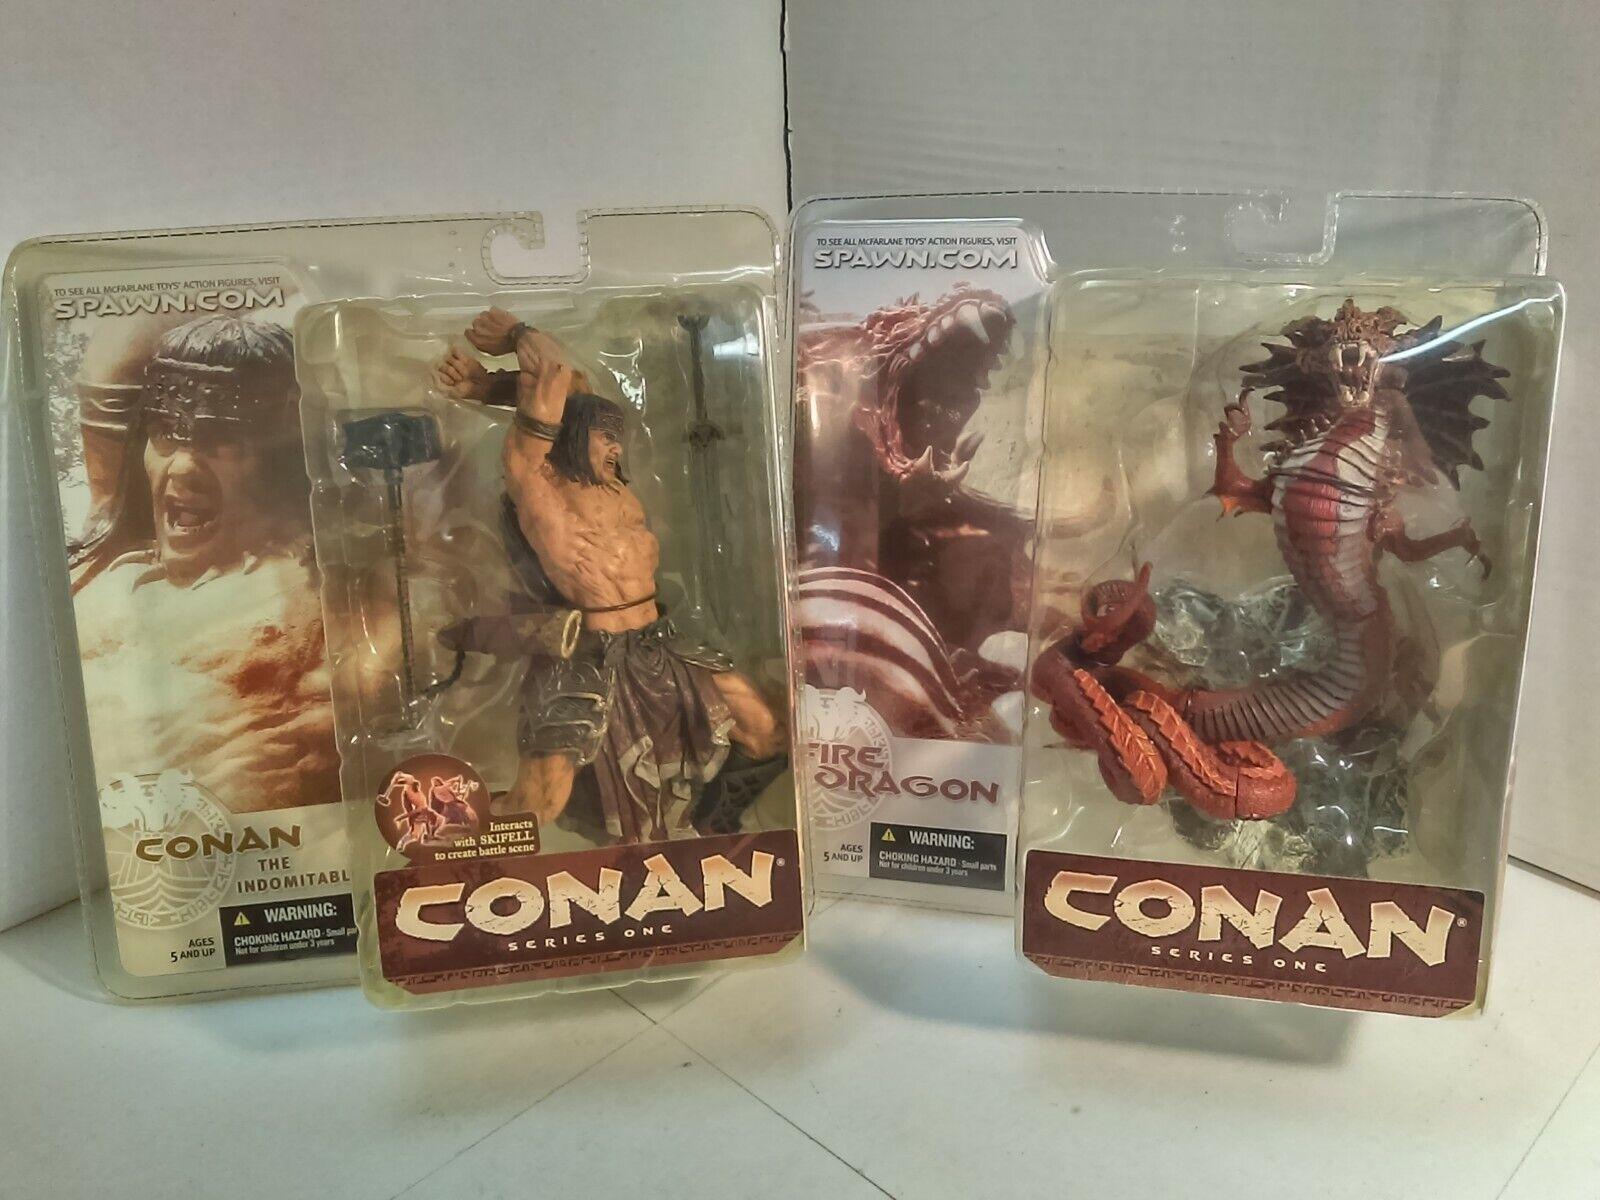 McFarlane Toys - Conan Series One Set of 2 - Conan the Indomitable & Fire Dragon